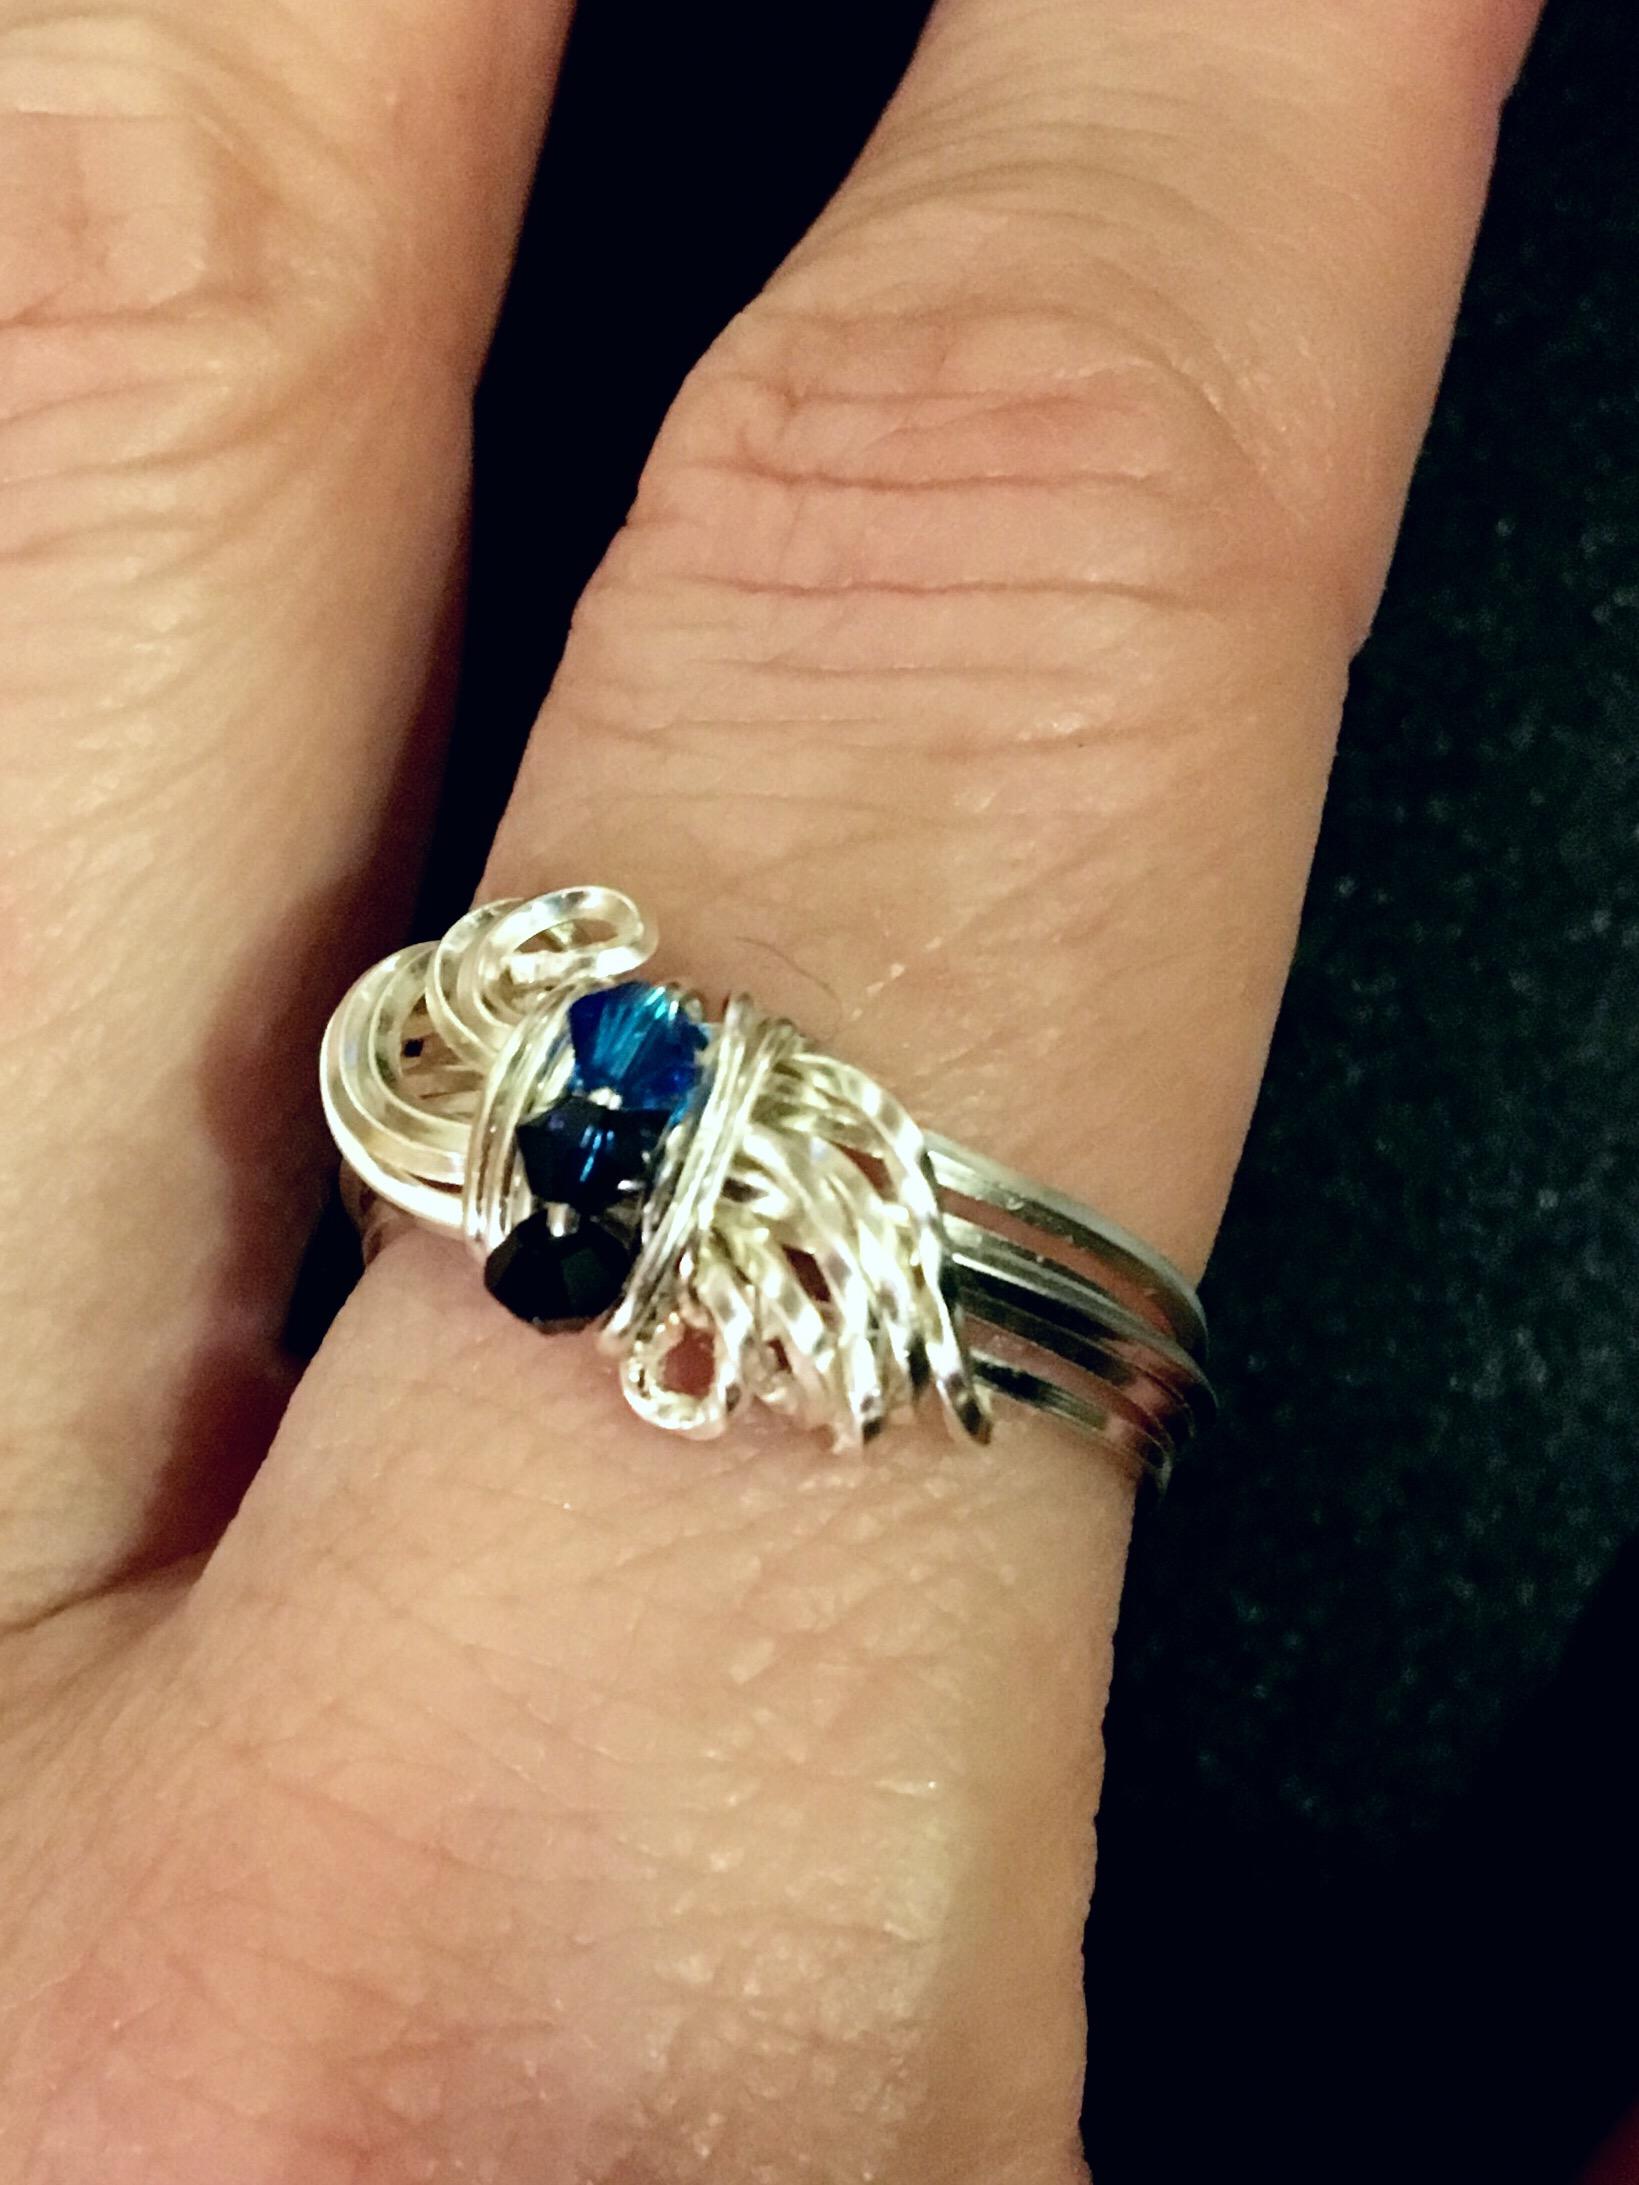 Dainty Deva Ring - Waves - Blue Swarovsky - silver Plater. JPEG